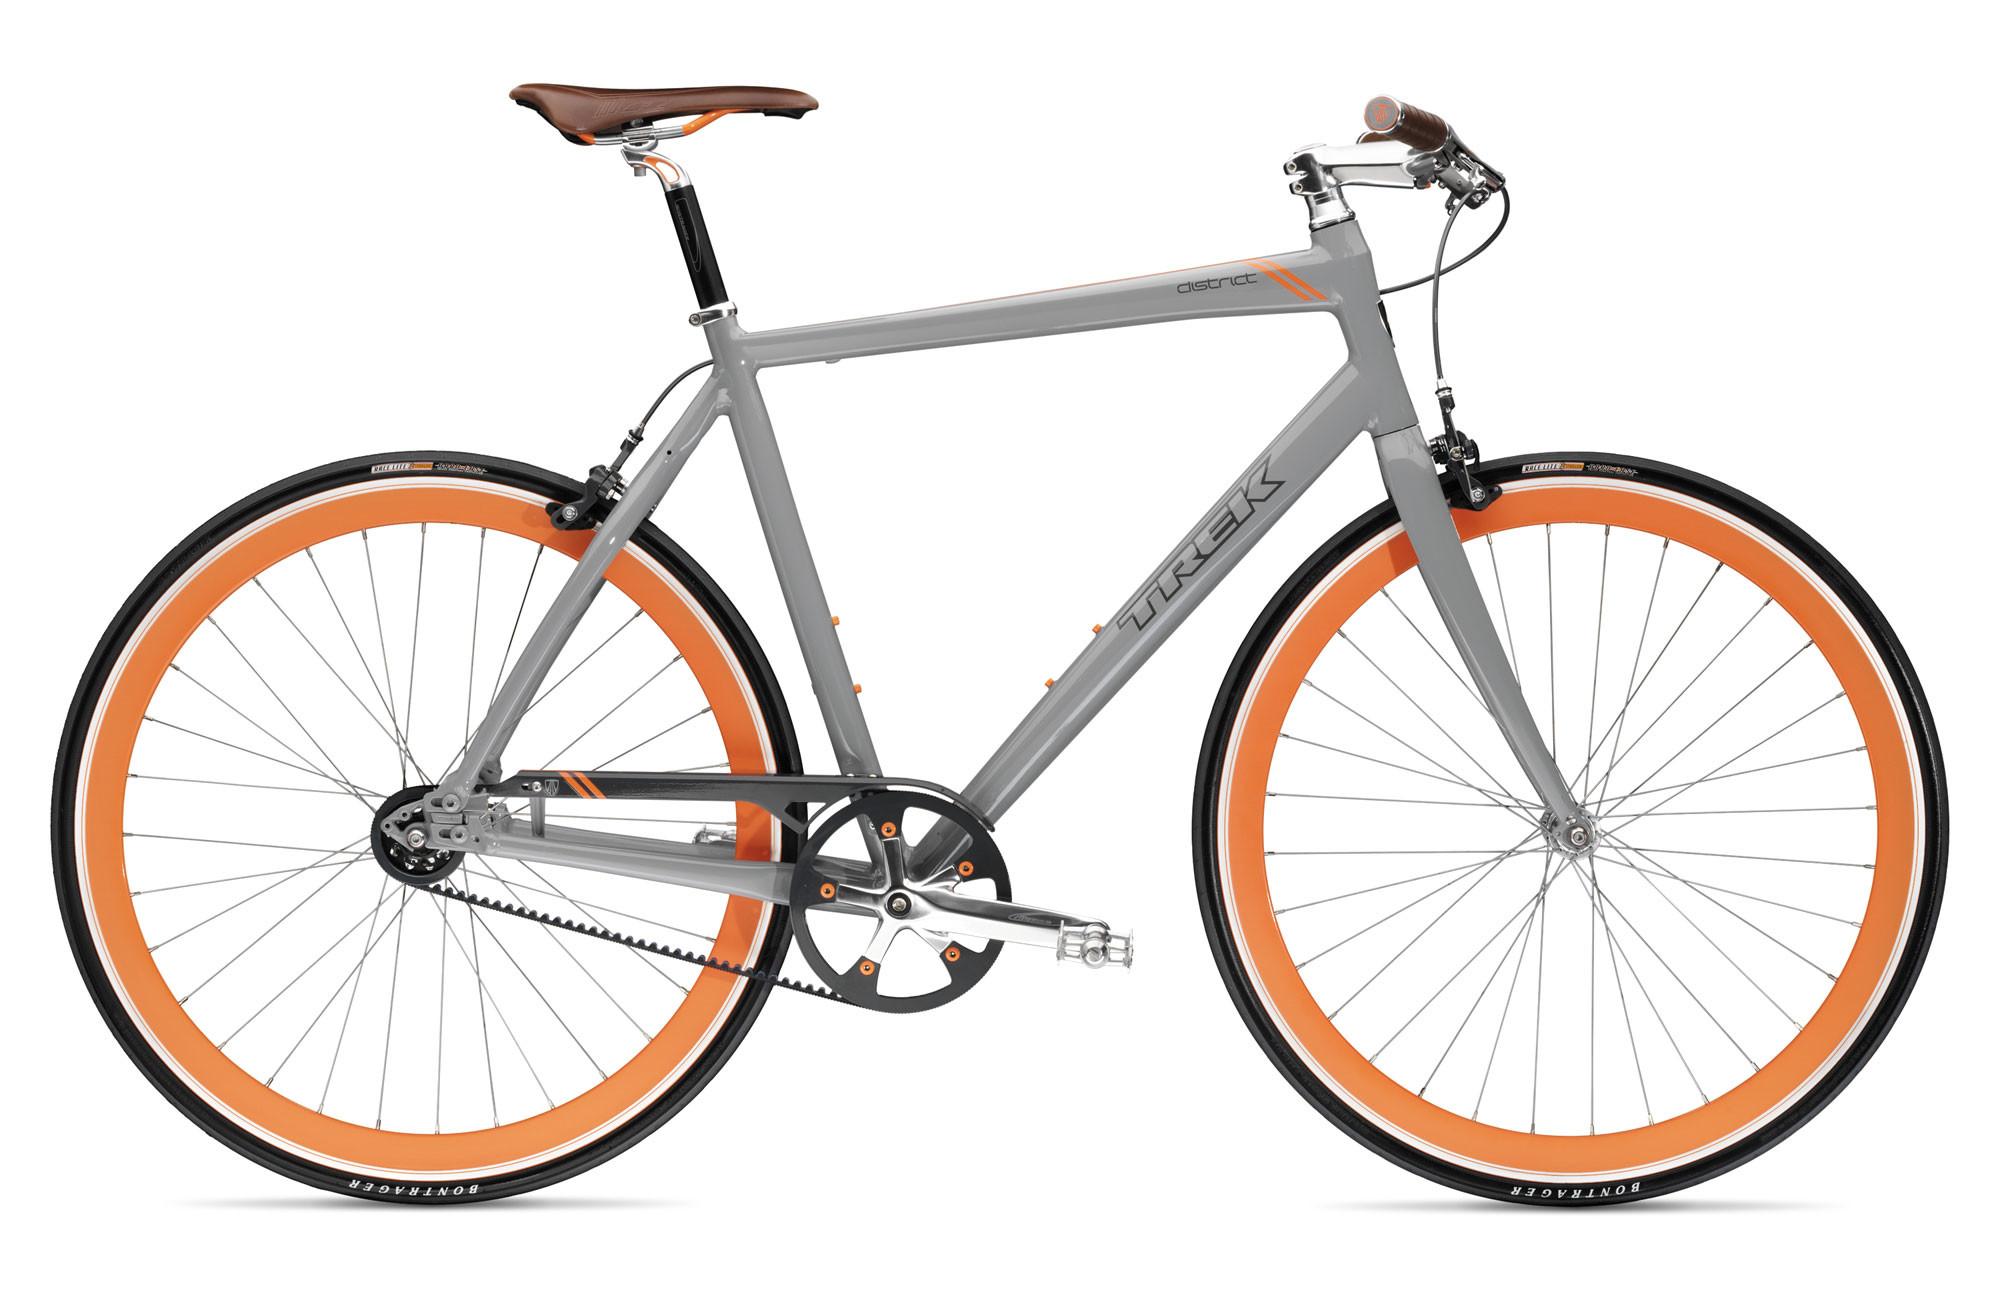 Res: 2000x1300, Beautiful Trek Bicycle Wallpapers FHDQ